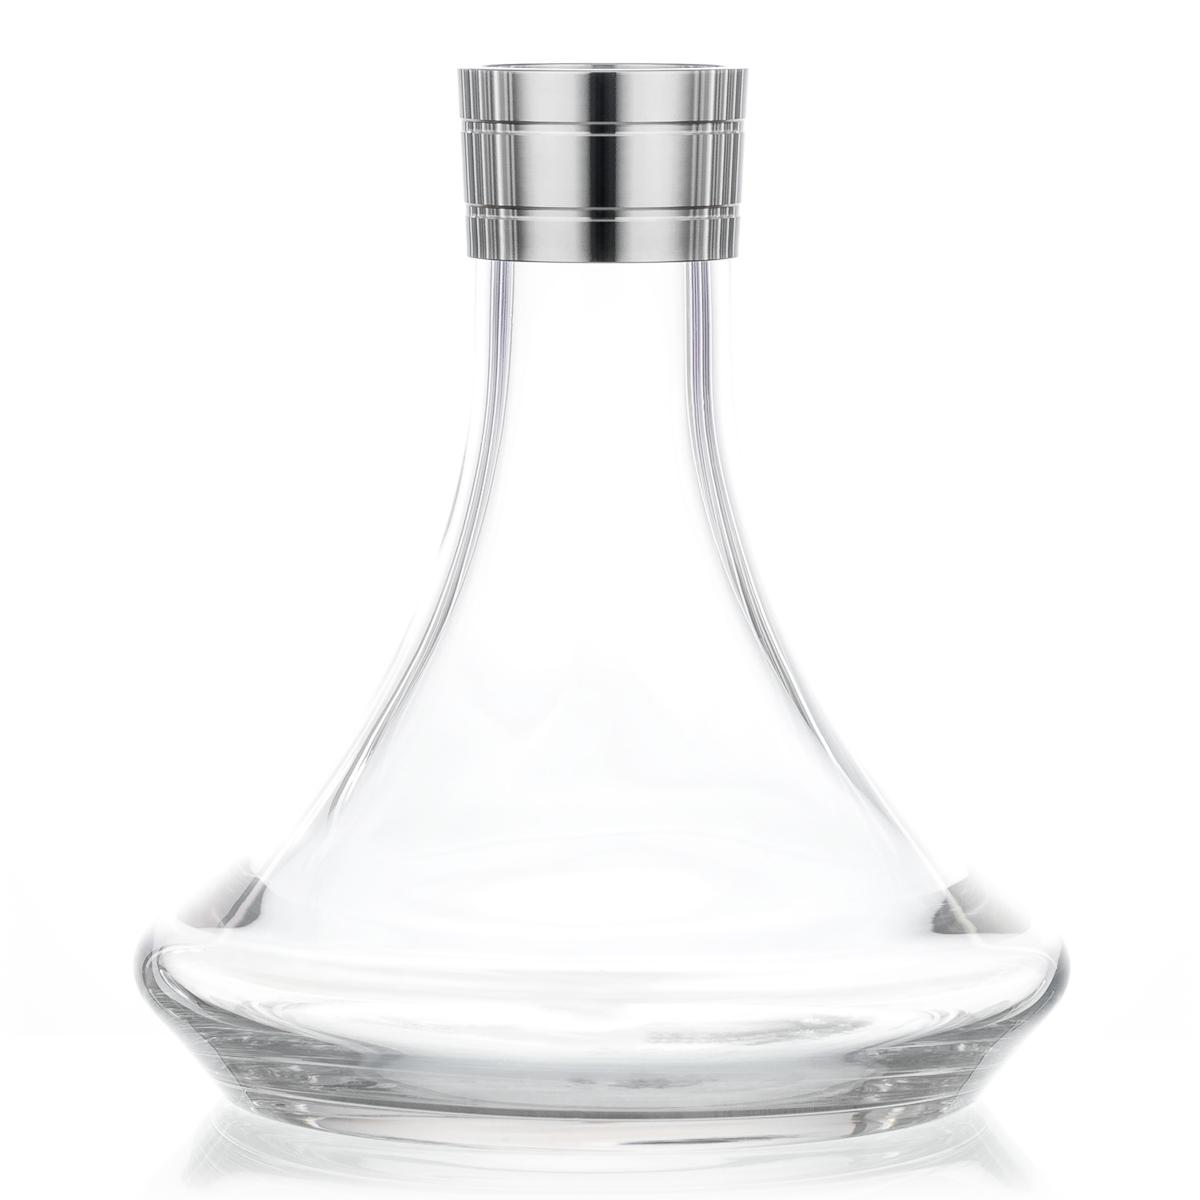 Aladin Shisha Ersatzglas MVP 360 (Shiny Clear)